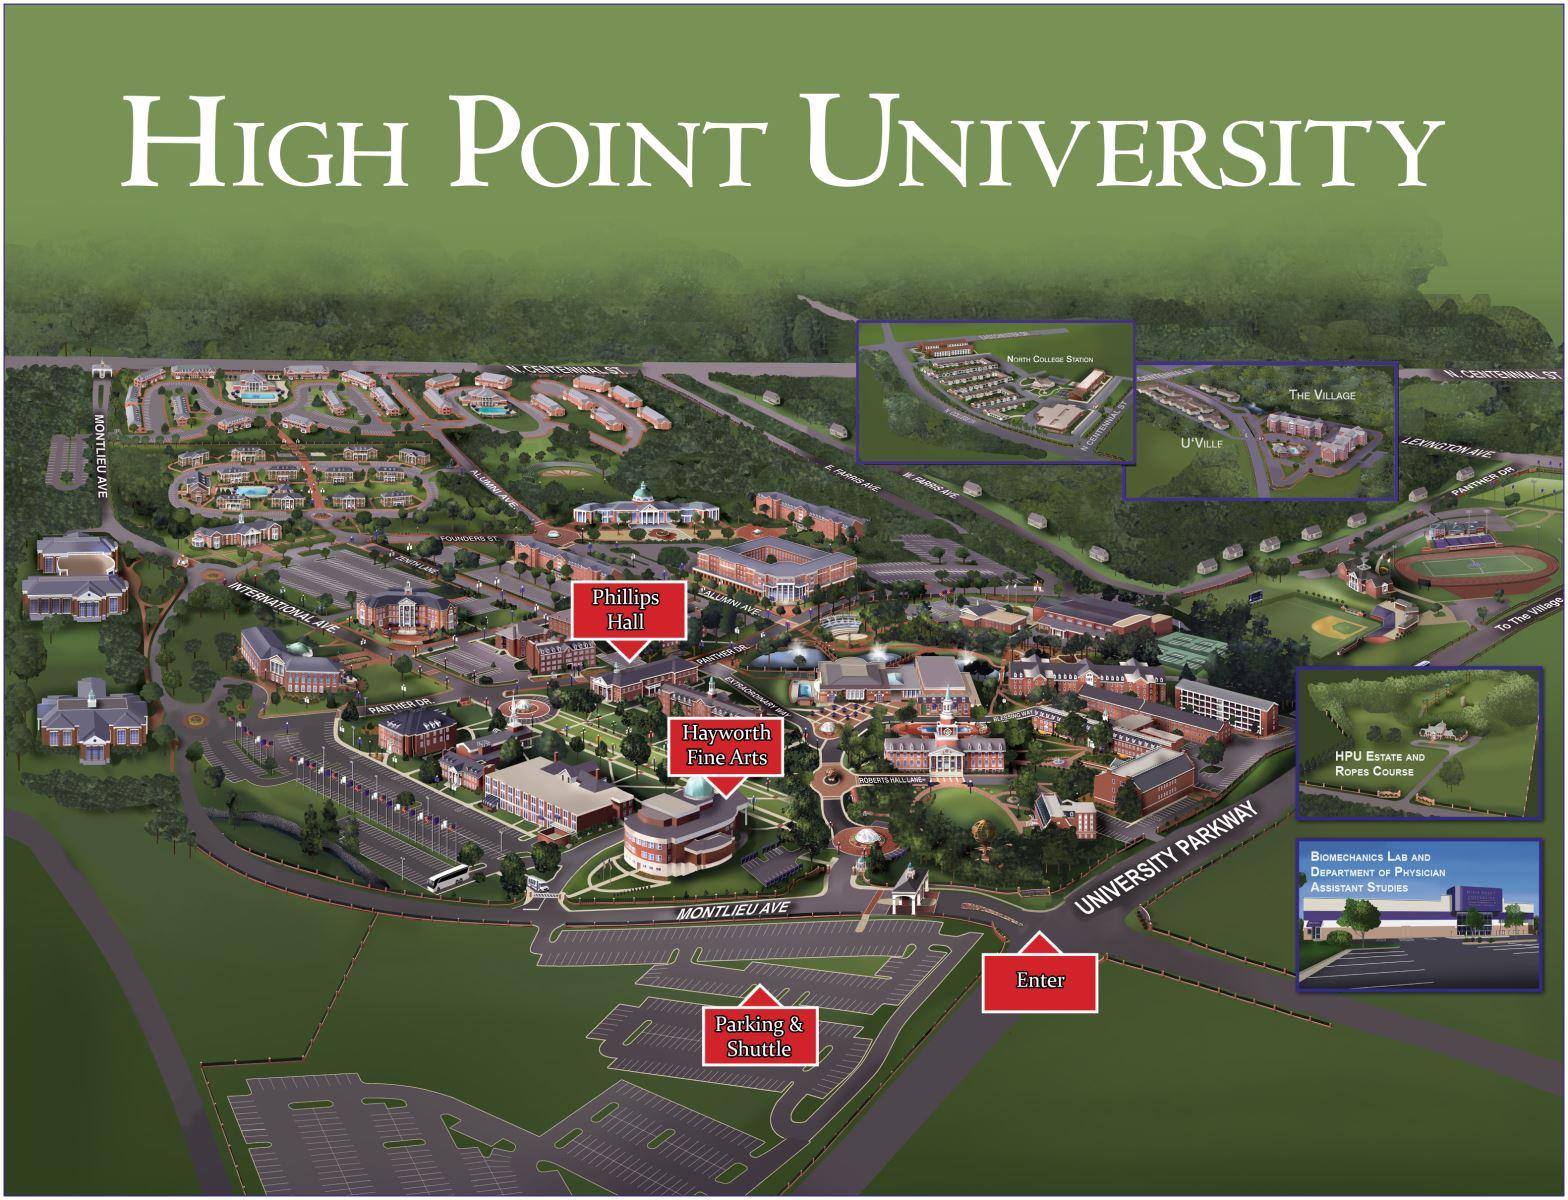 North Carolina Campus Compact